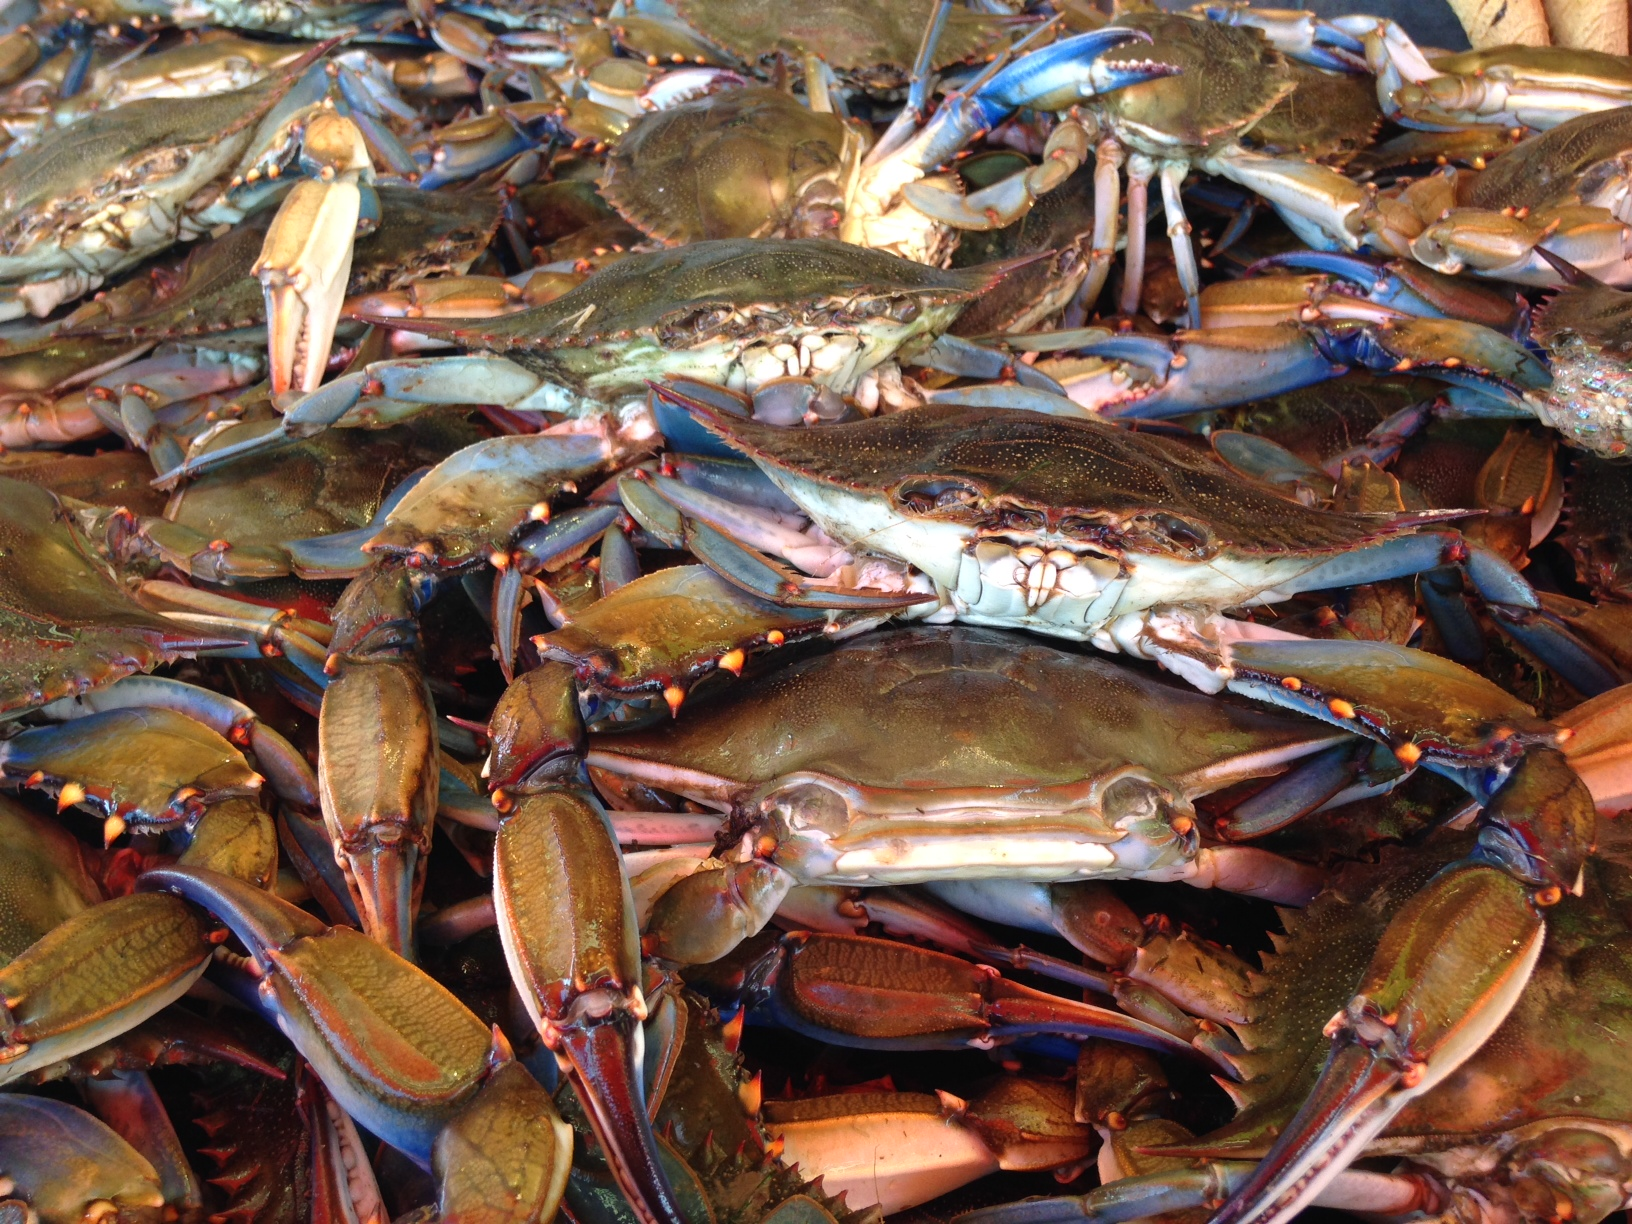 Dredge survey results: Blue crabs in Bay more plentiful